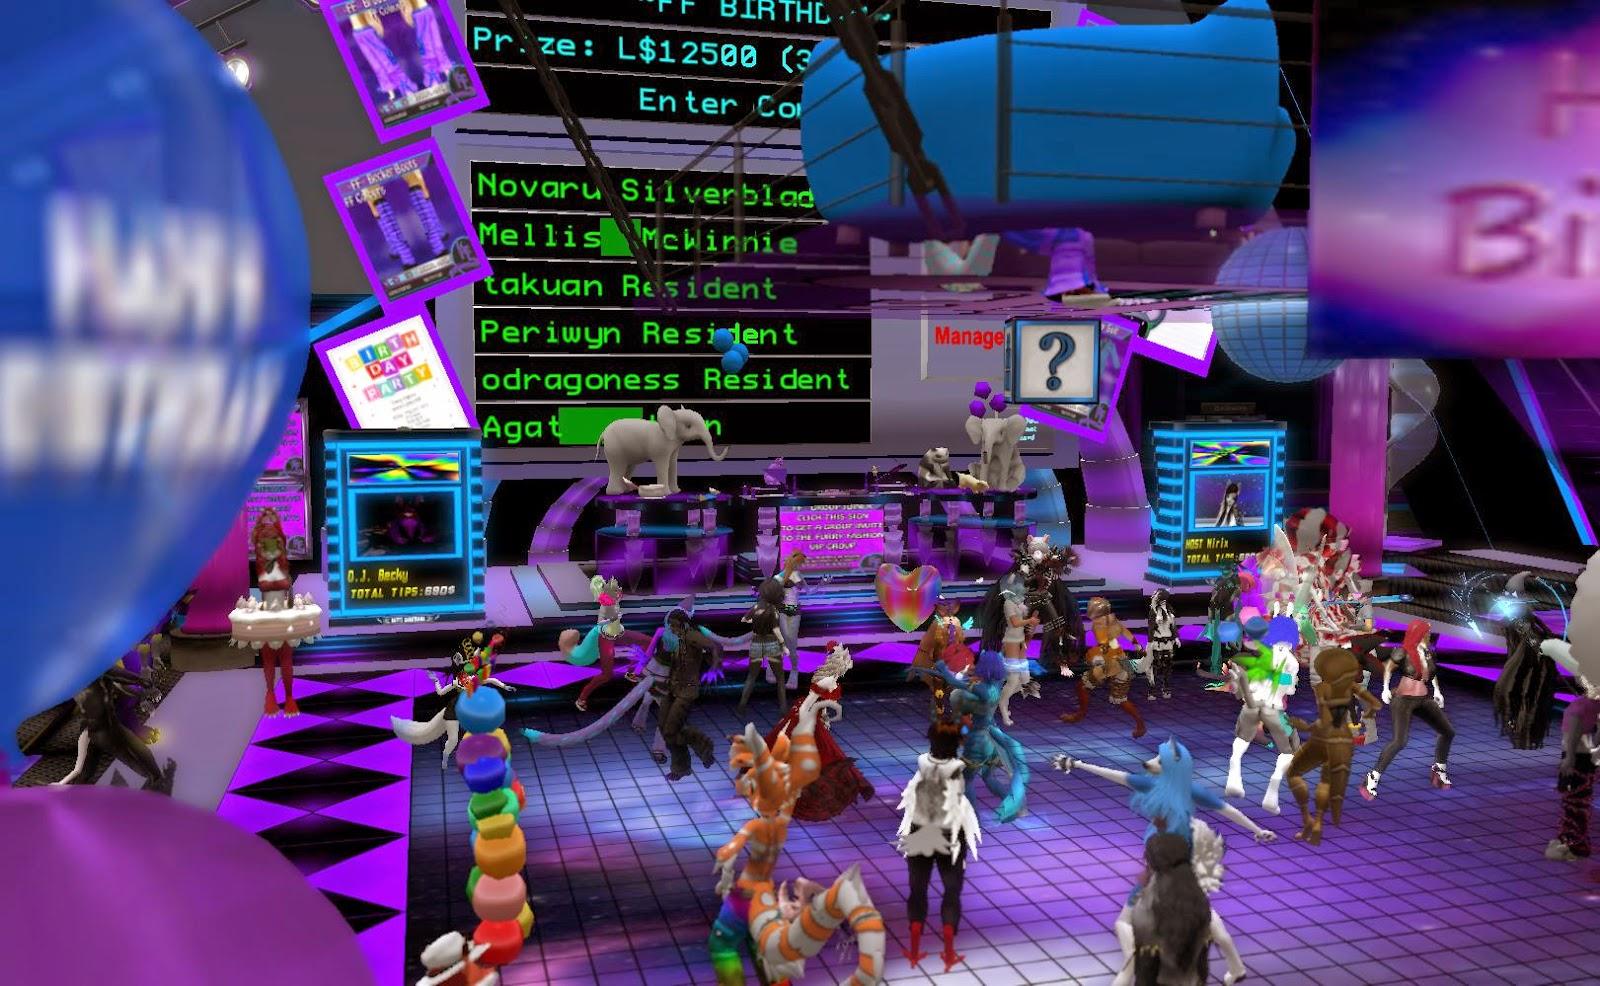 Second Life Newser: Furry Fashion Celebrates Eight Years